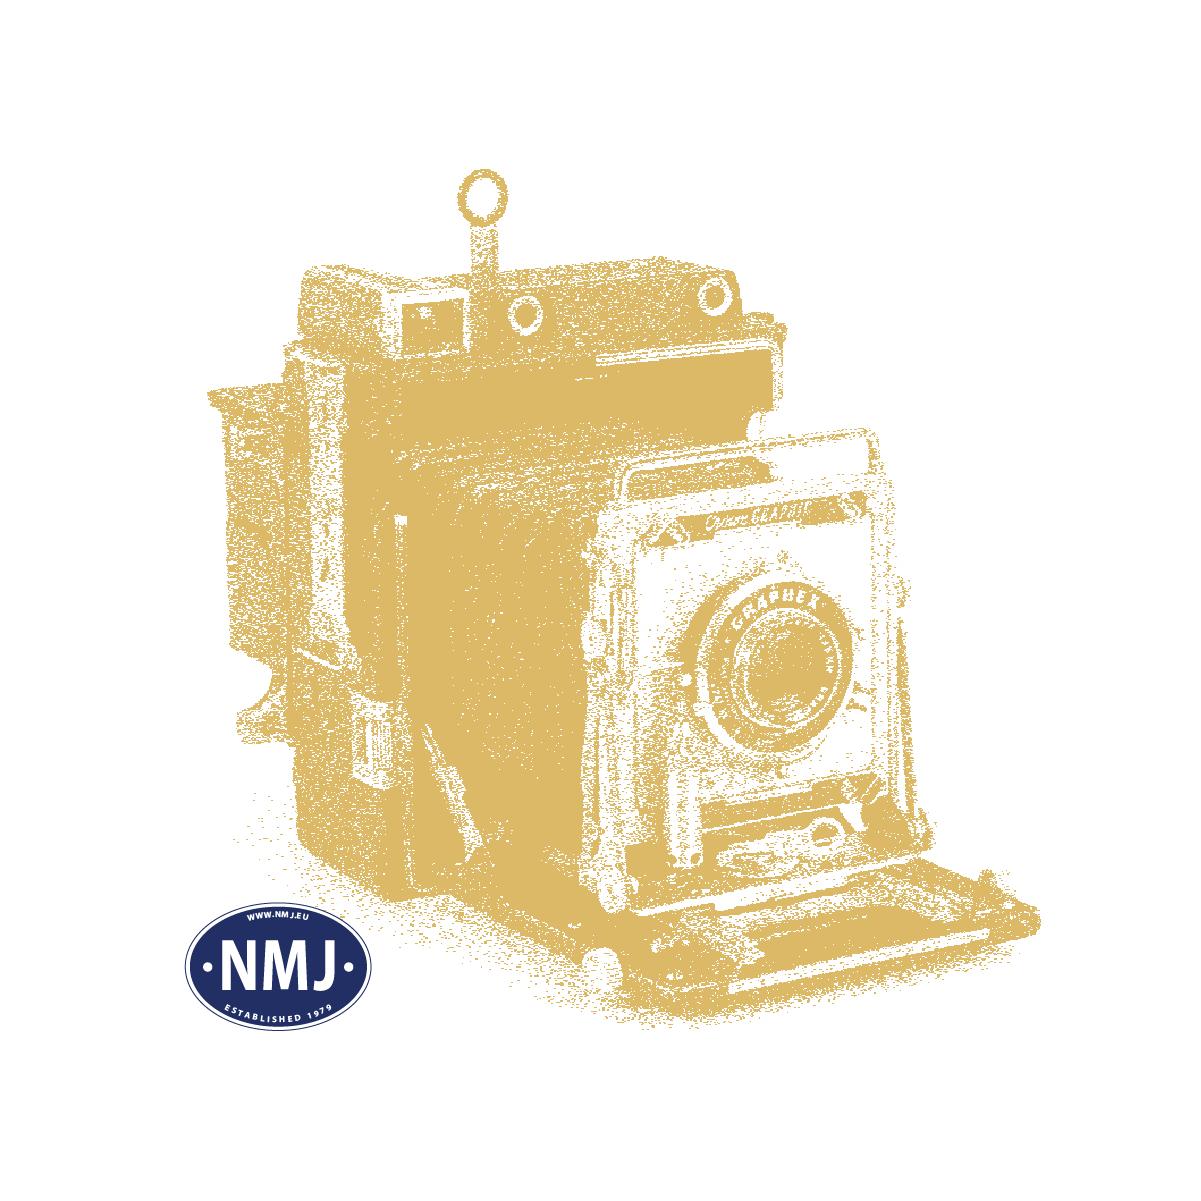 NMJT86.301AC - NMJ Topline NSB El11.2104, rot/silber, AC Digital